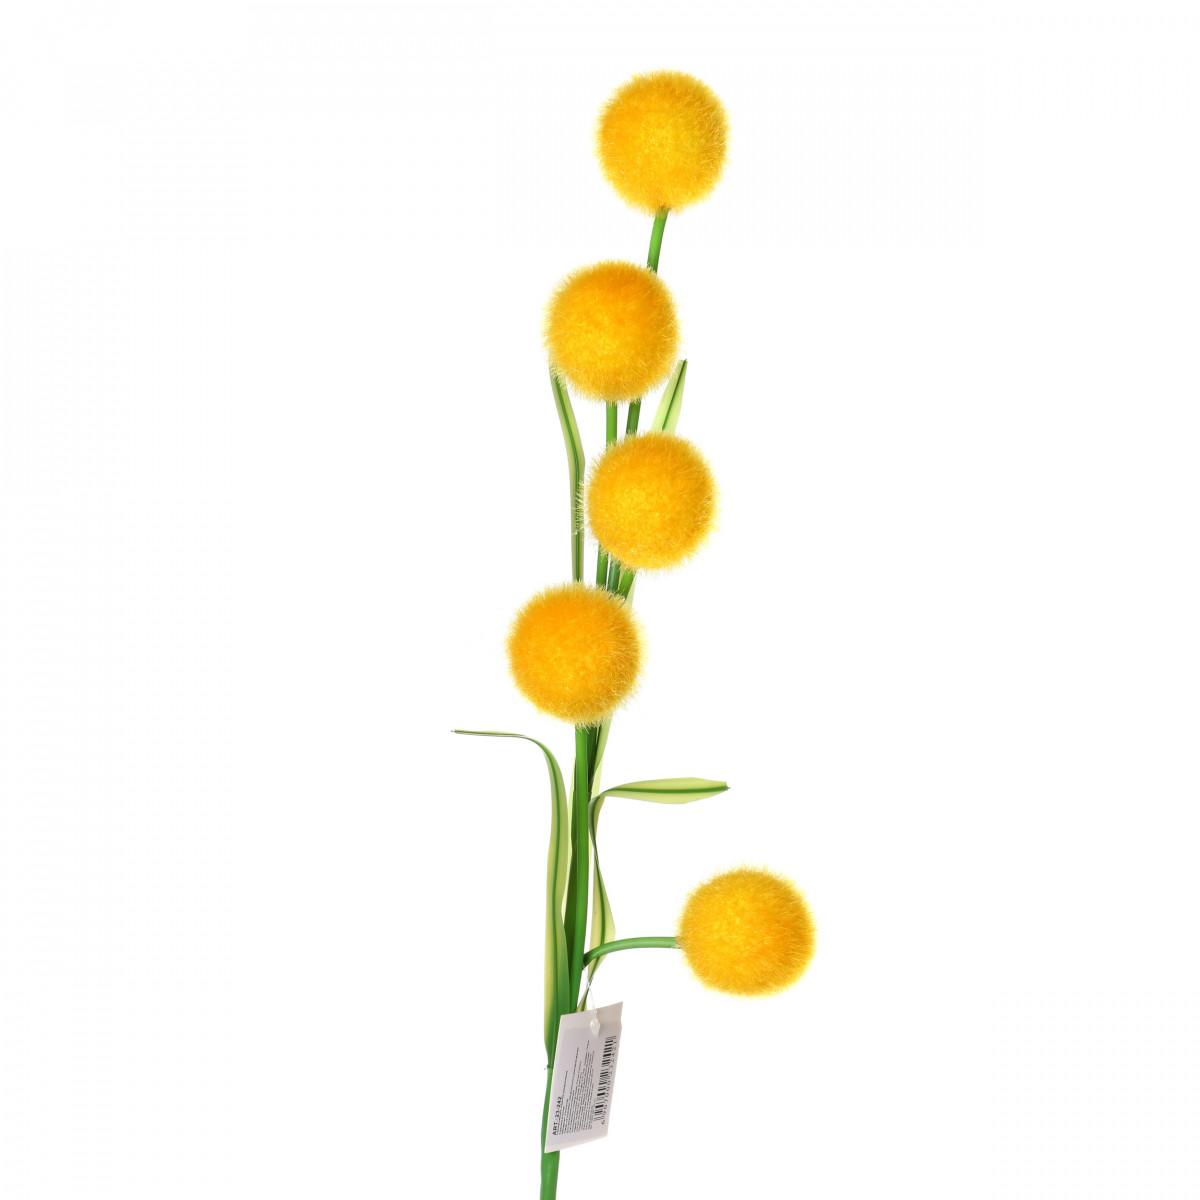 {} Arti-M Искусственный цветок Normand  (85 см) rovertime rovertime rtm 85